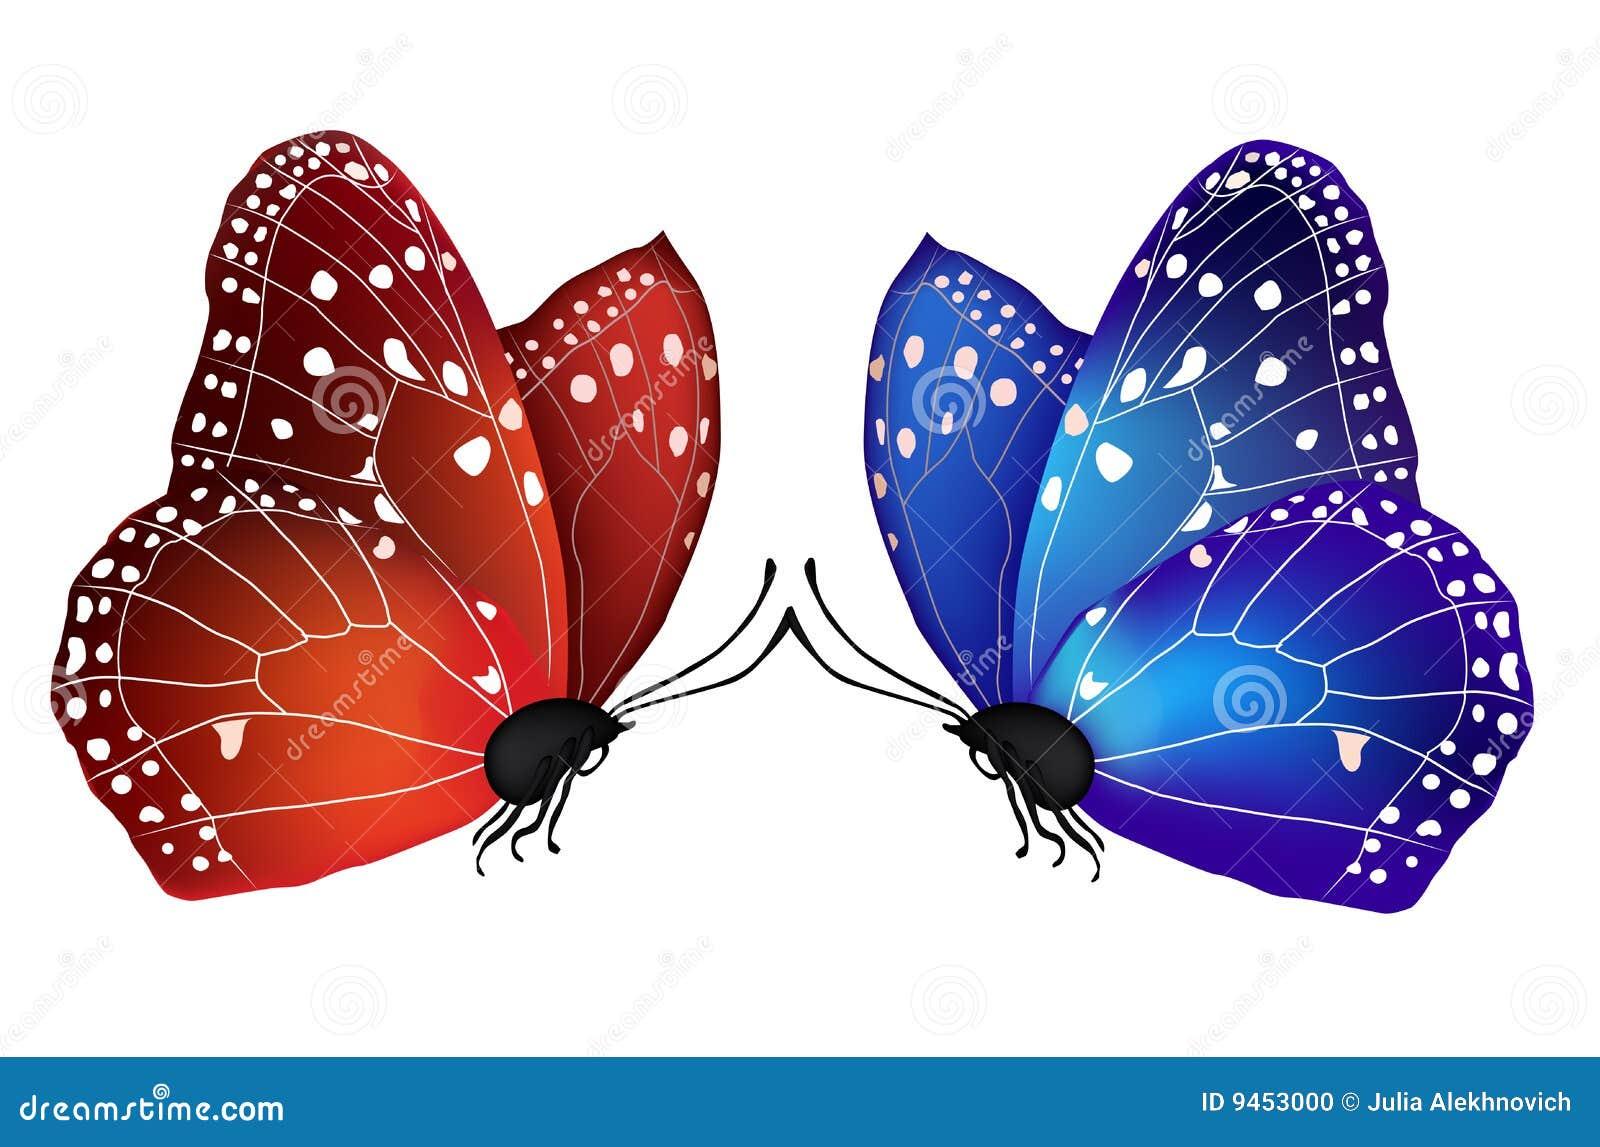 Dibujos animados Disney, Pokemon, de animales y mariposas